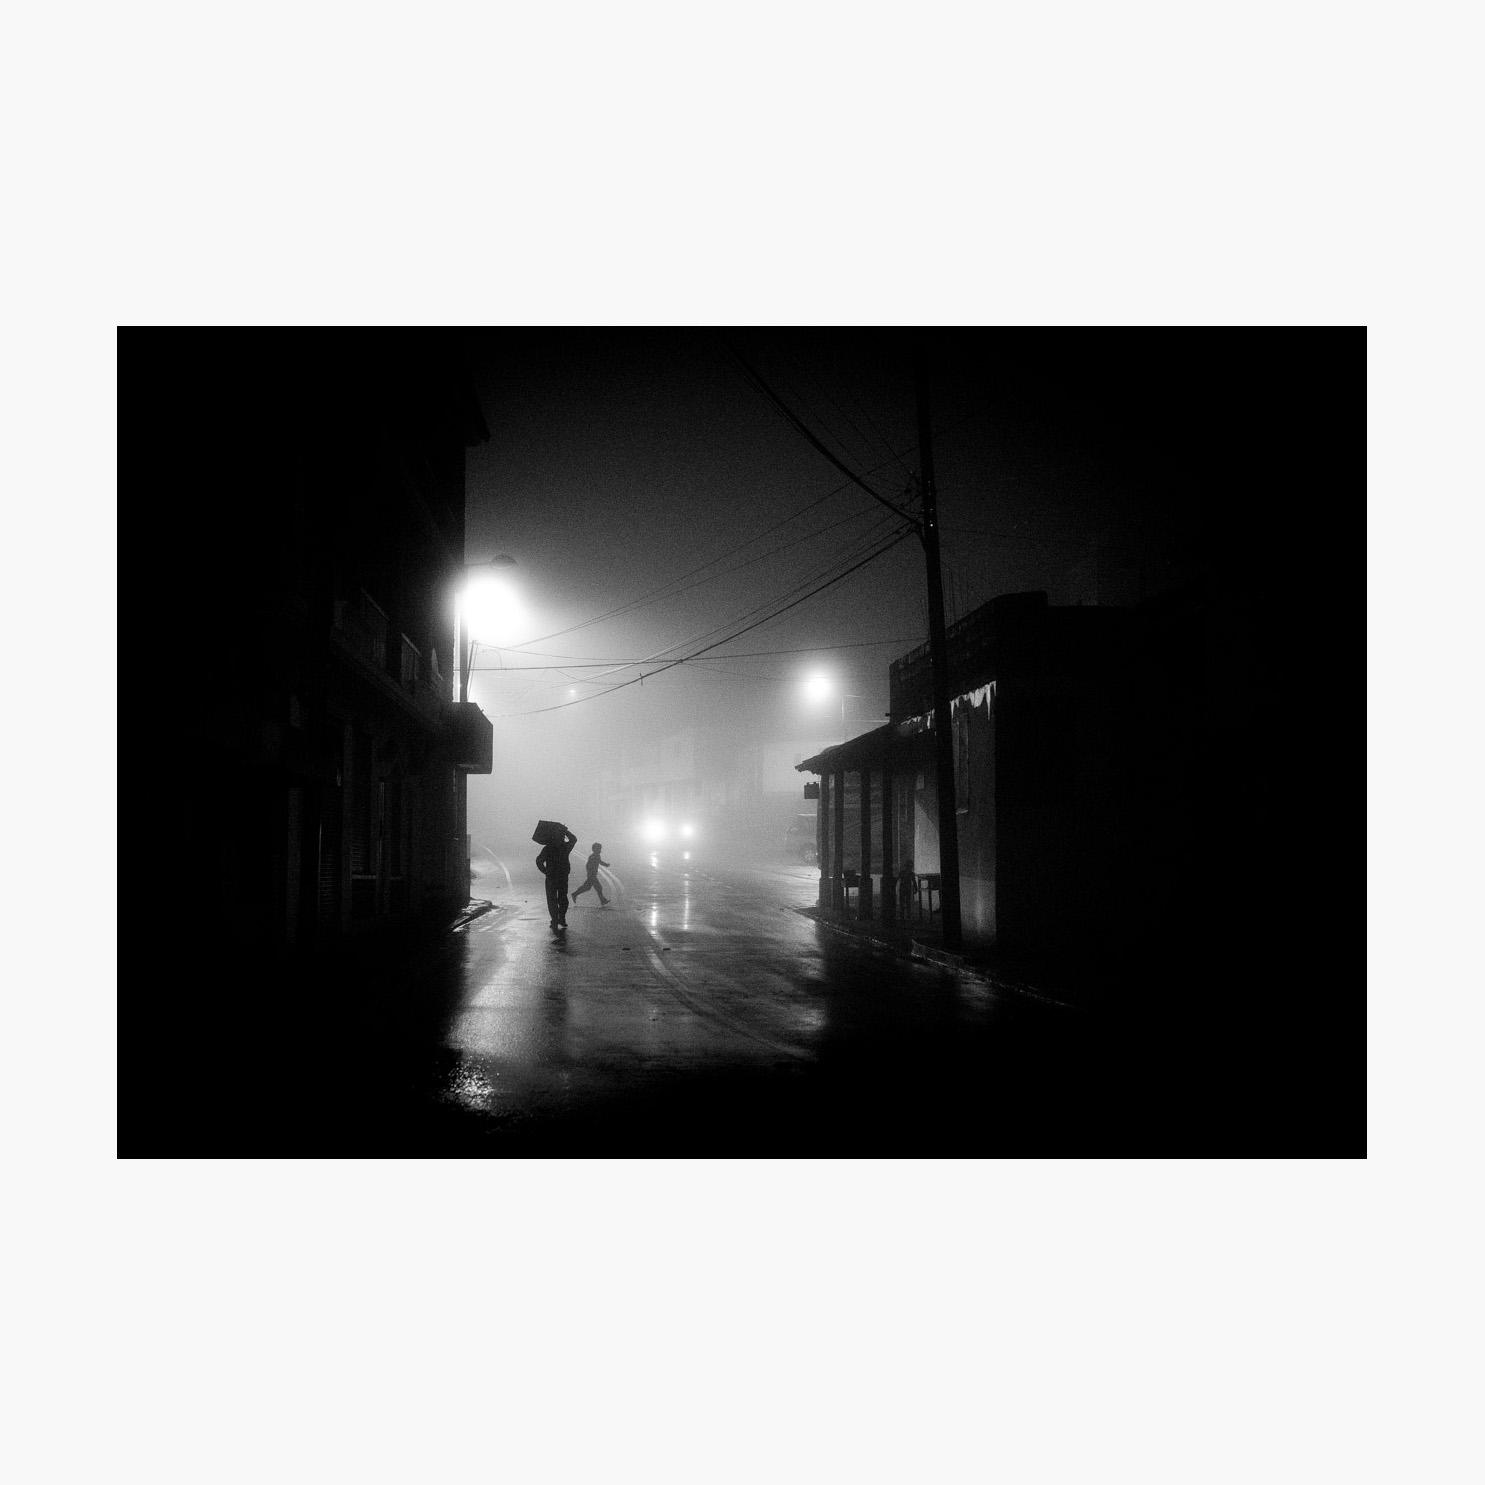 ©-Harry-W-Edmonds-2018-@photographersnote-the-long-road-PN02.jpg